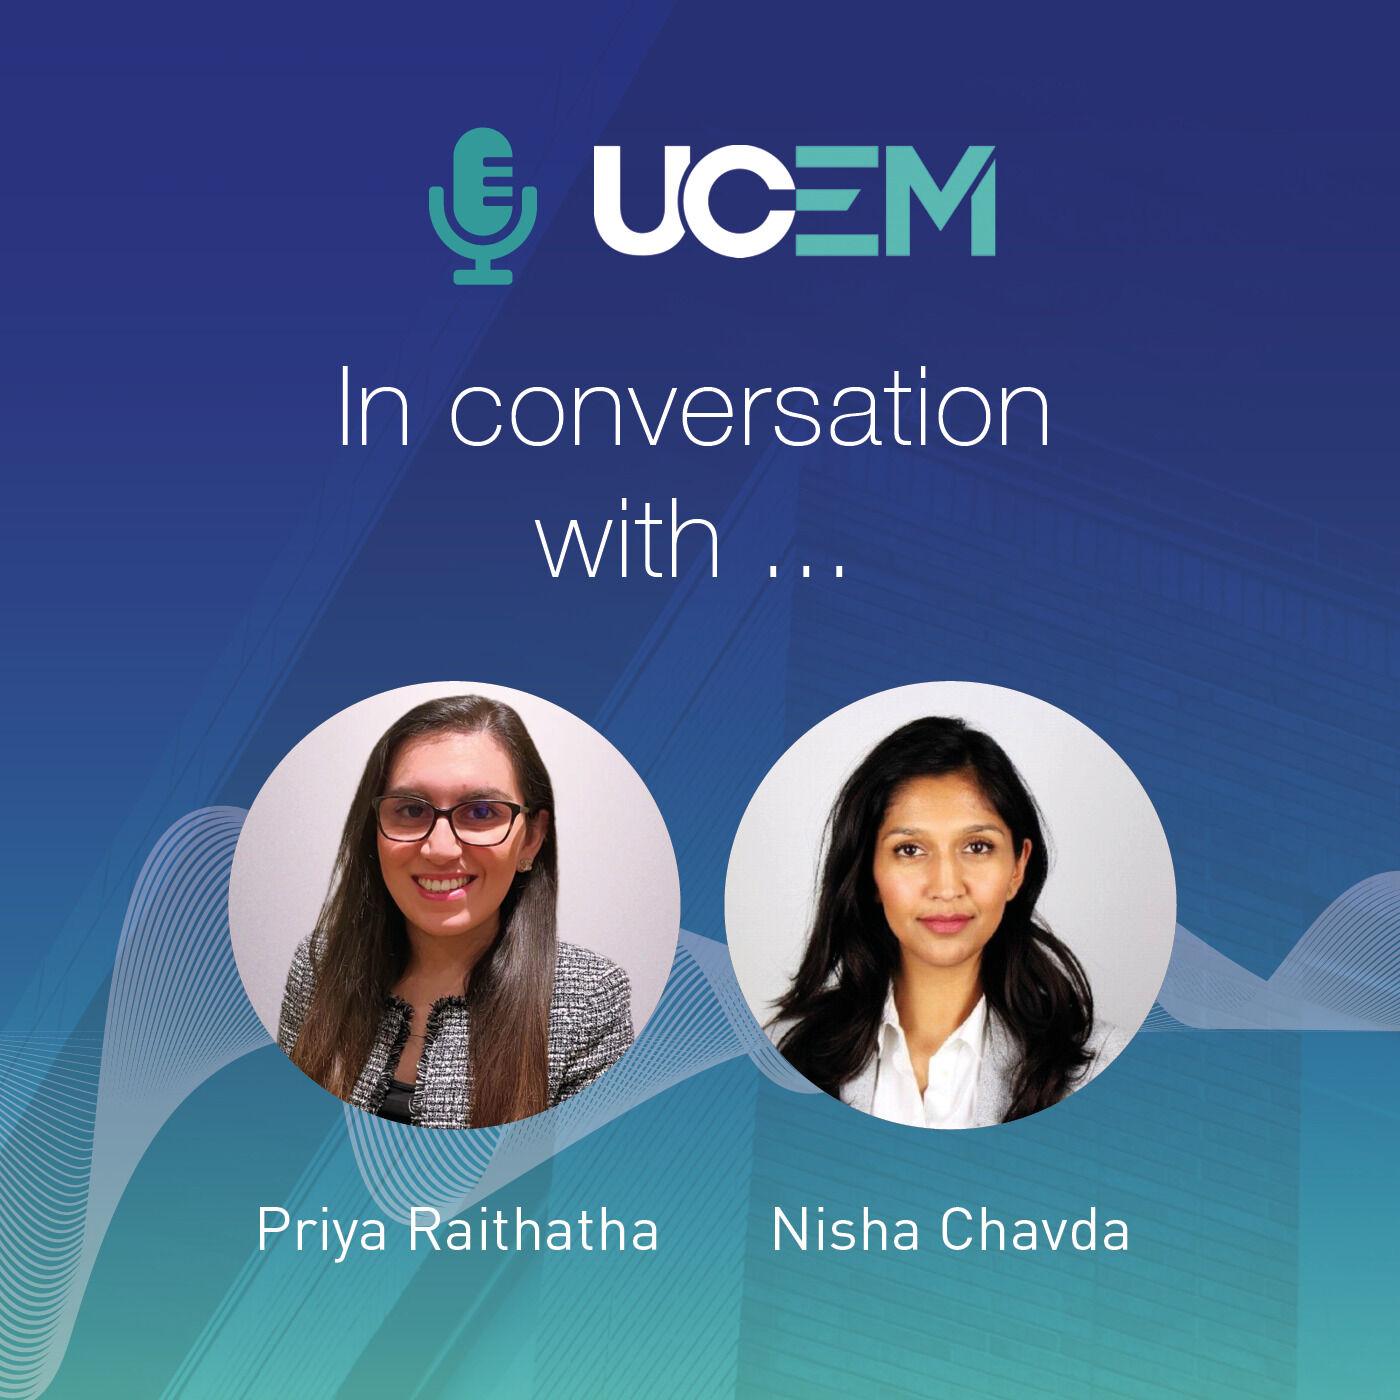 UCEM in conversation with... Brown Girls Empowering - Episode 6